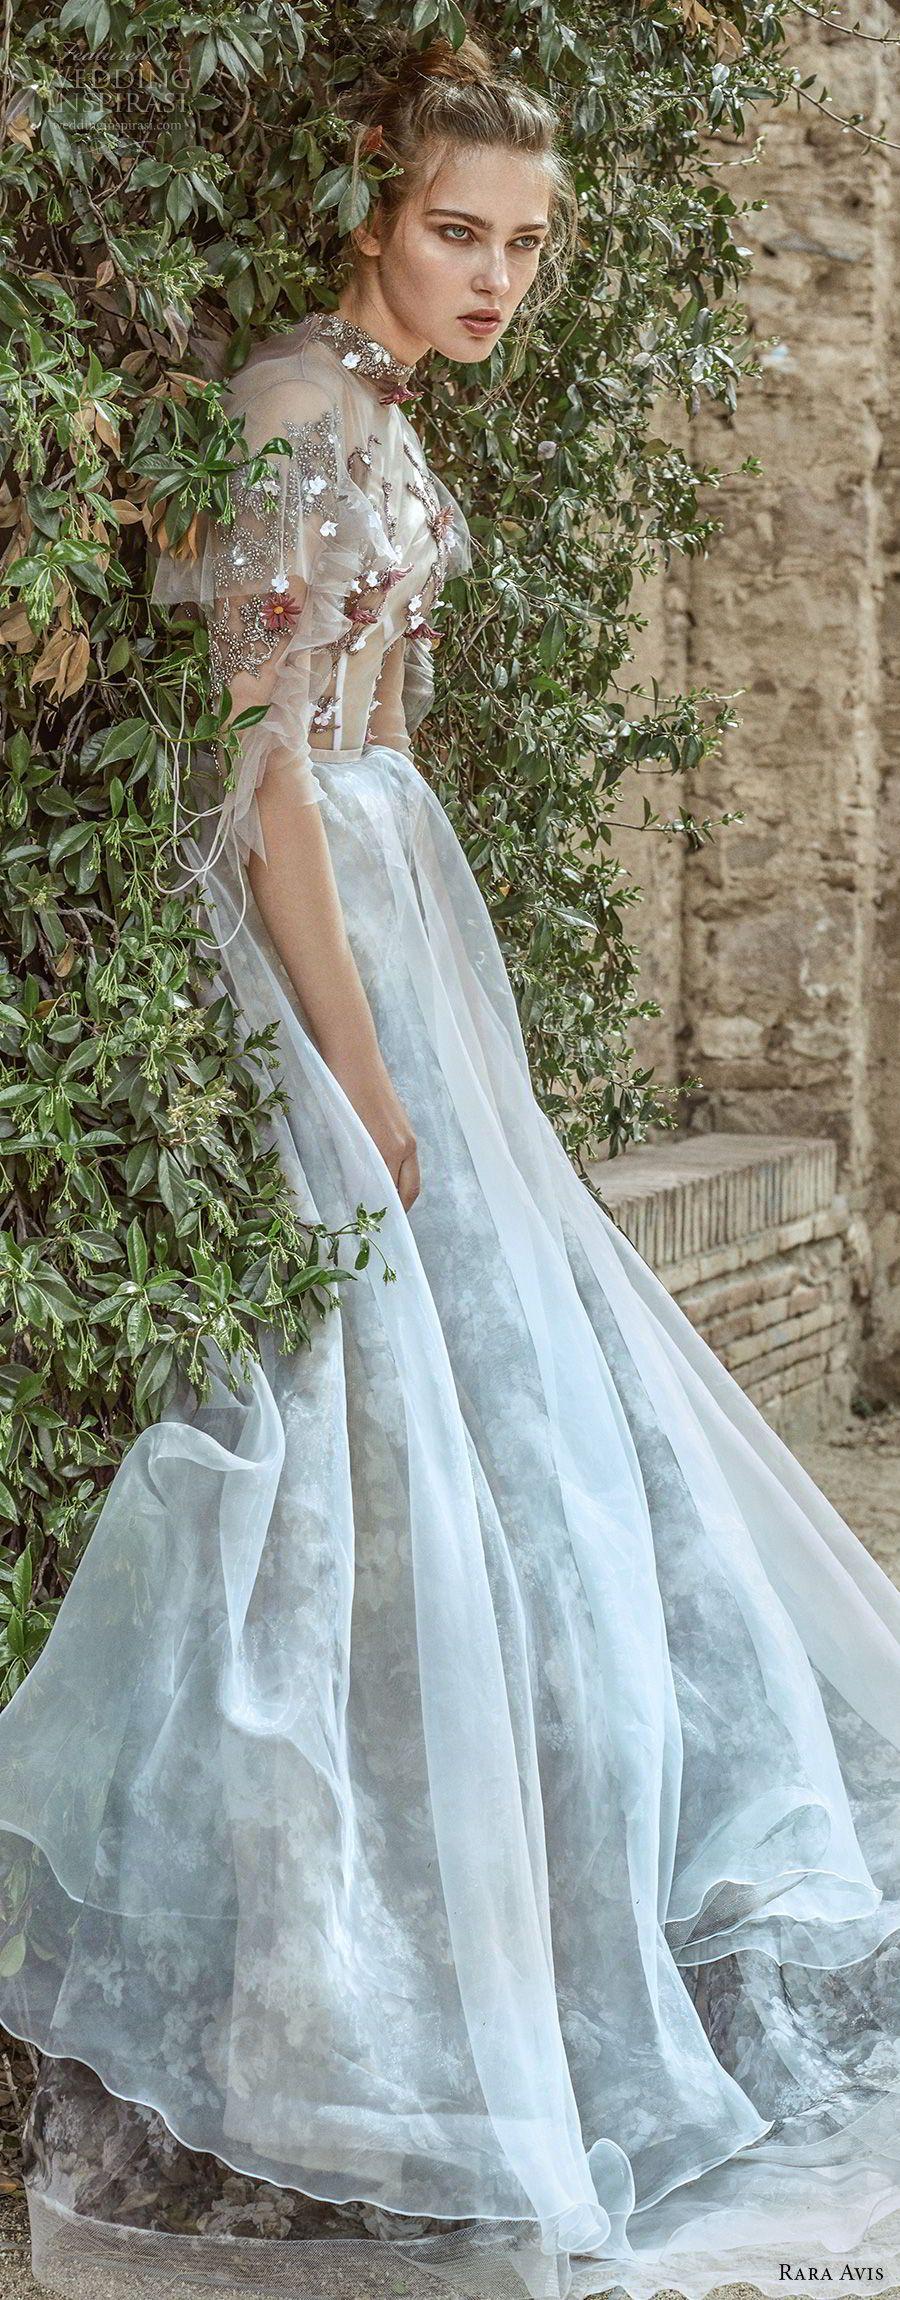 Rara Avis 2017 Wedding Dresses — Floral Paradise Bridal Collection ...